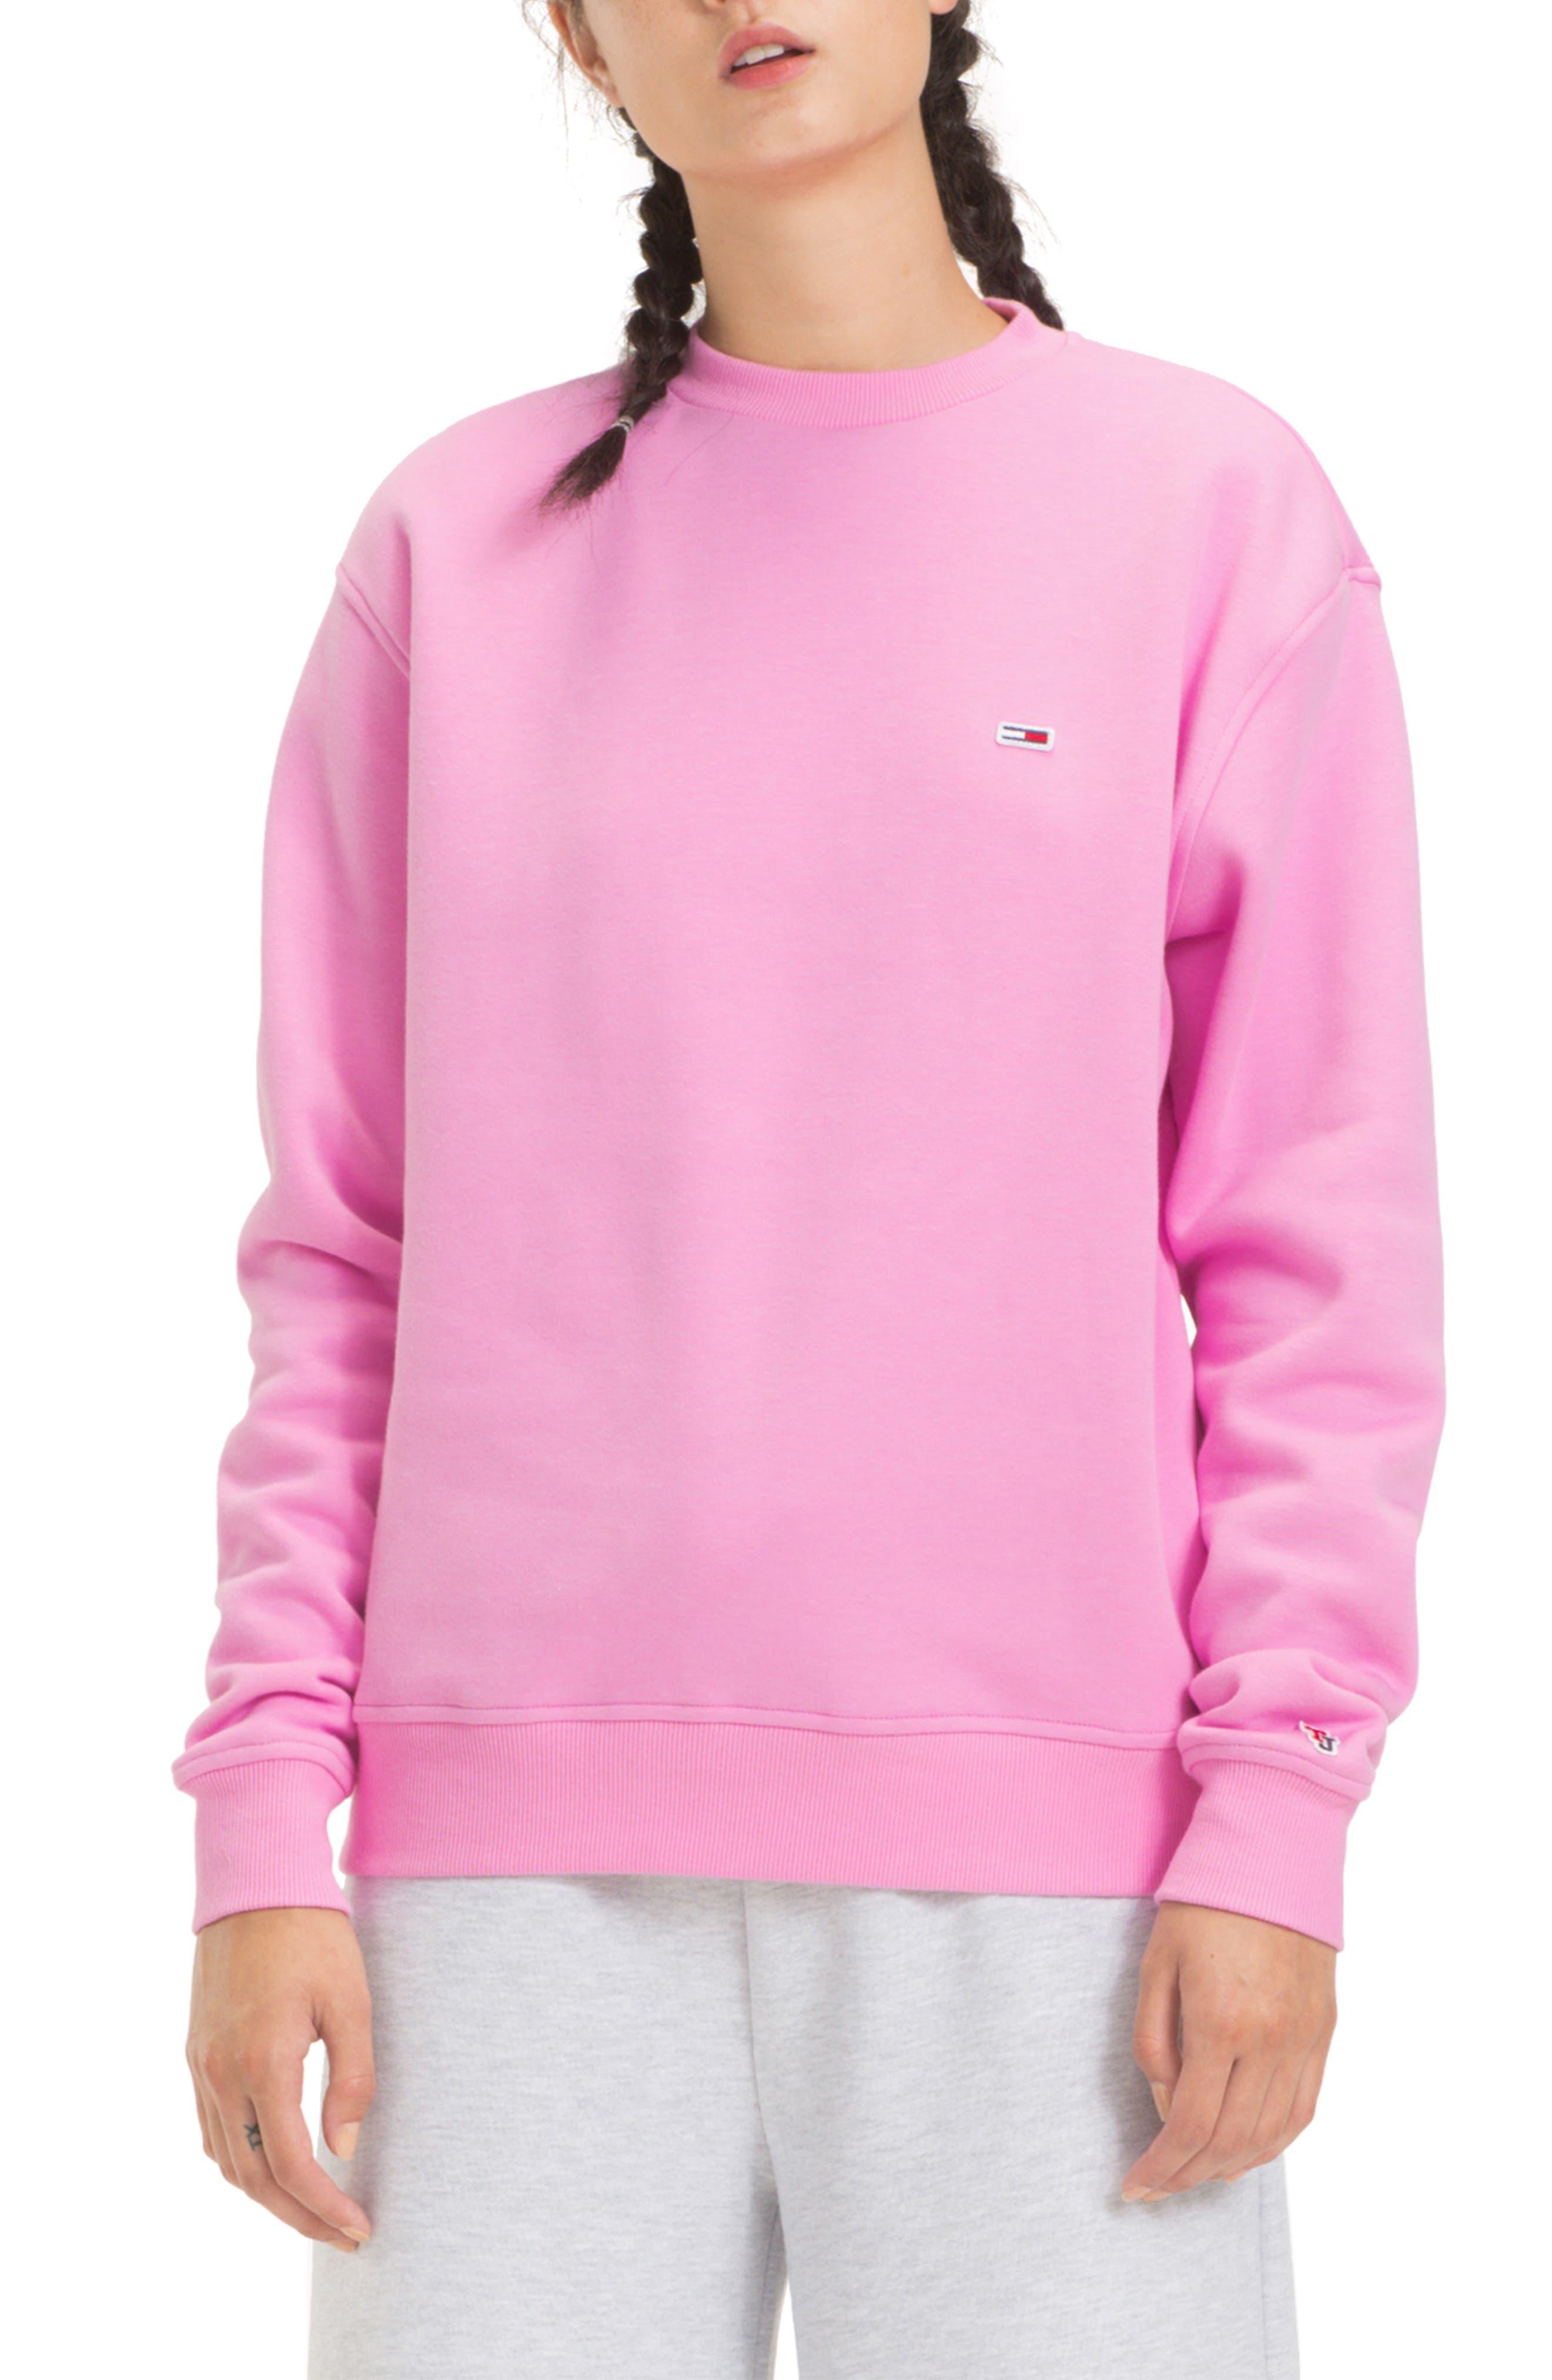 TOMMY JEANS,                             TJW Tommy Classics Sweatshirt,                             Main thumbnail 1, color,                             LILAC CHIFFON